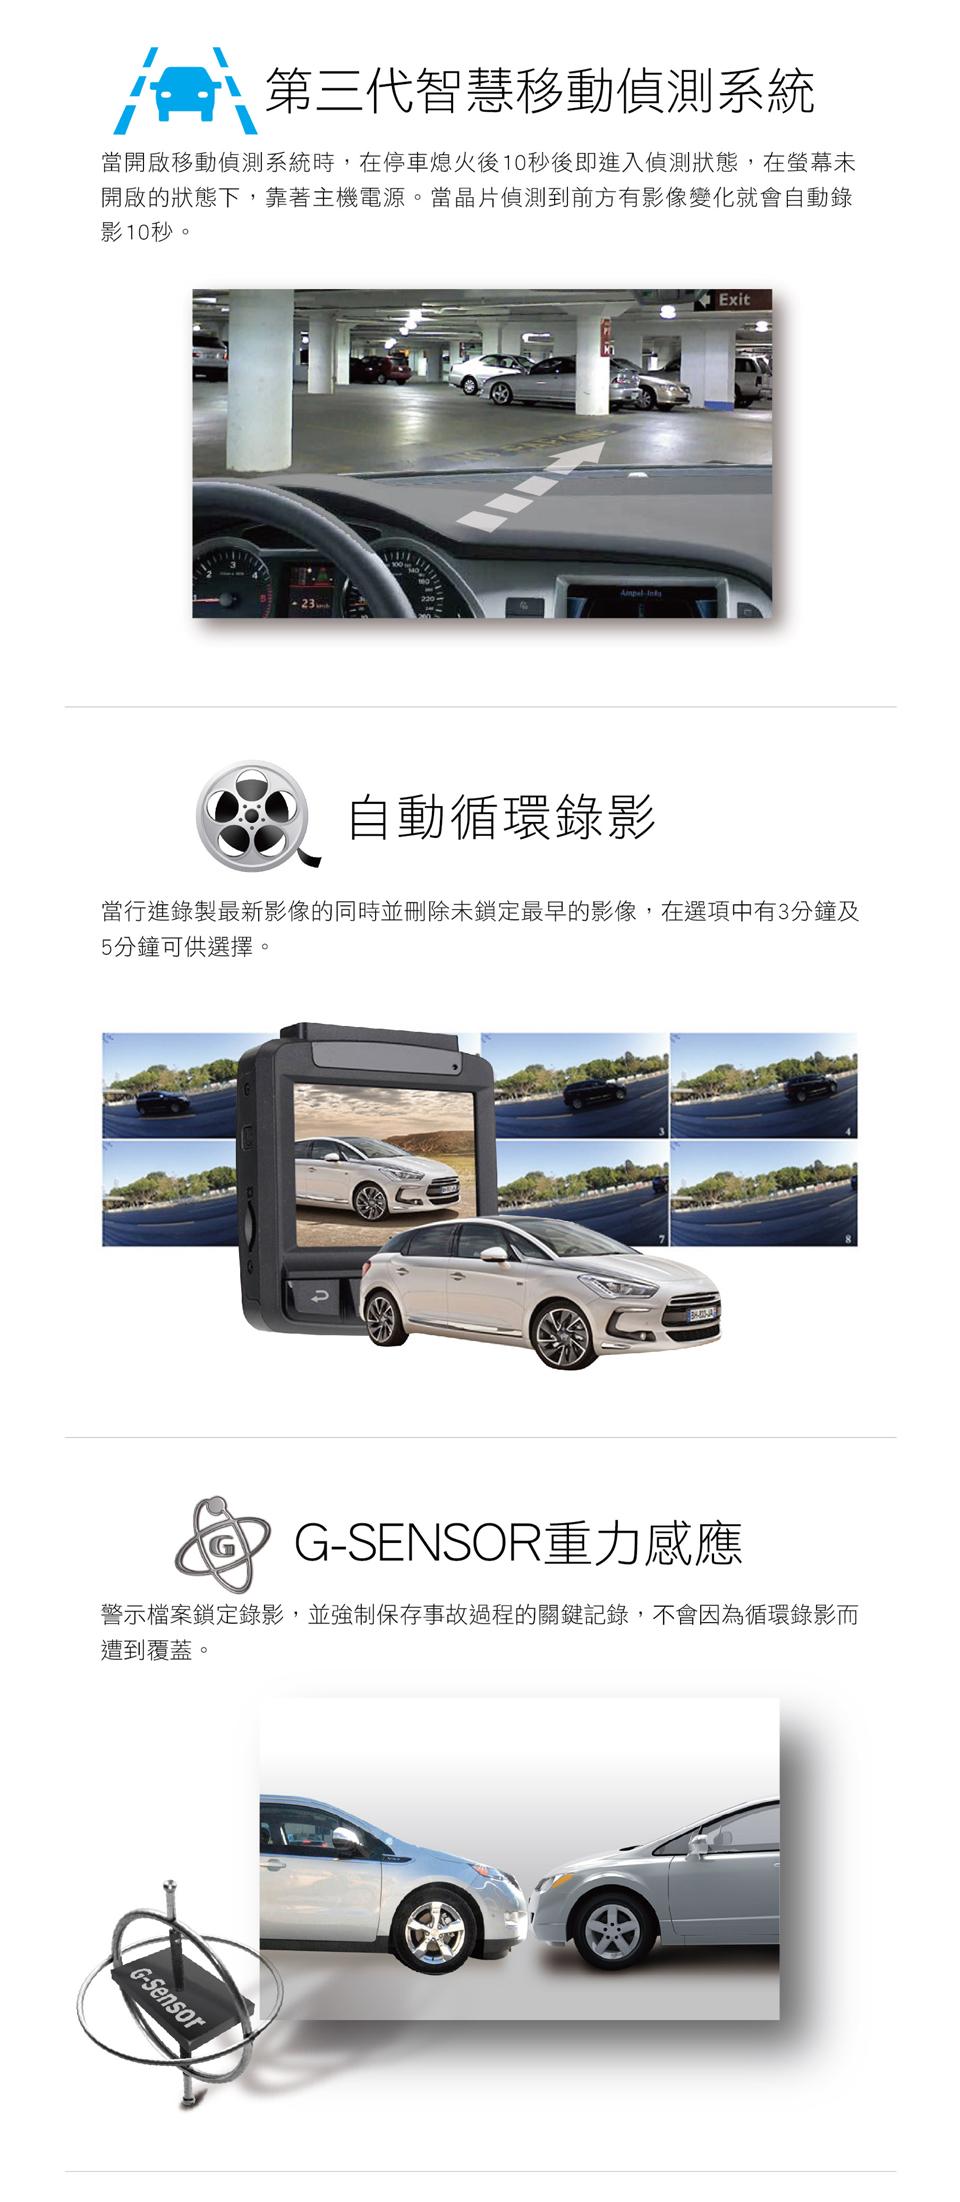 HP_f335_powerpage